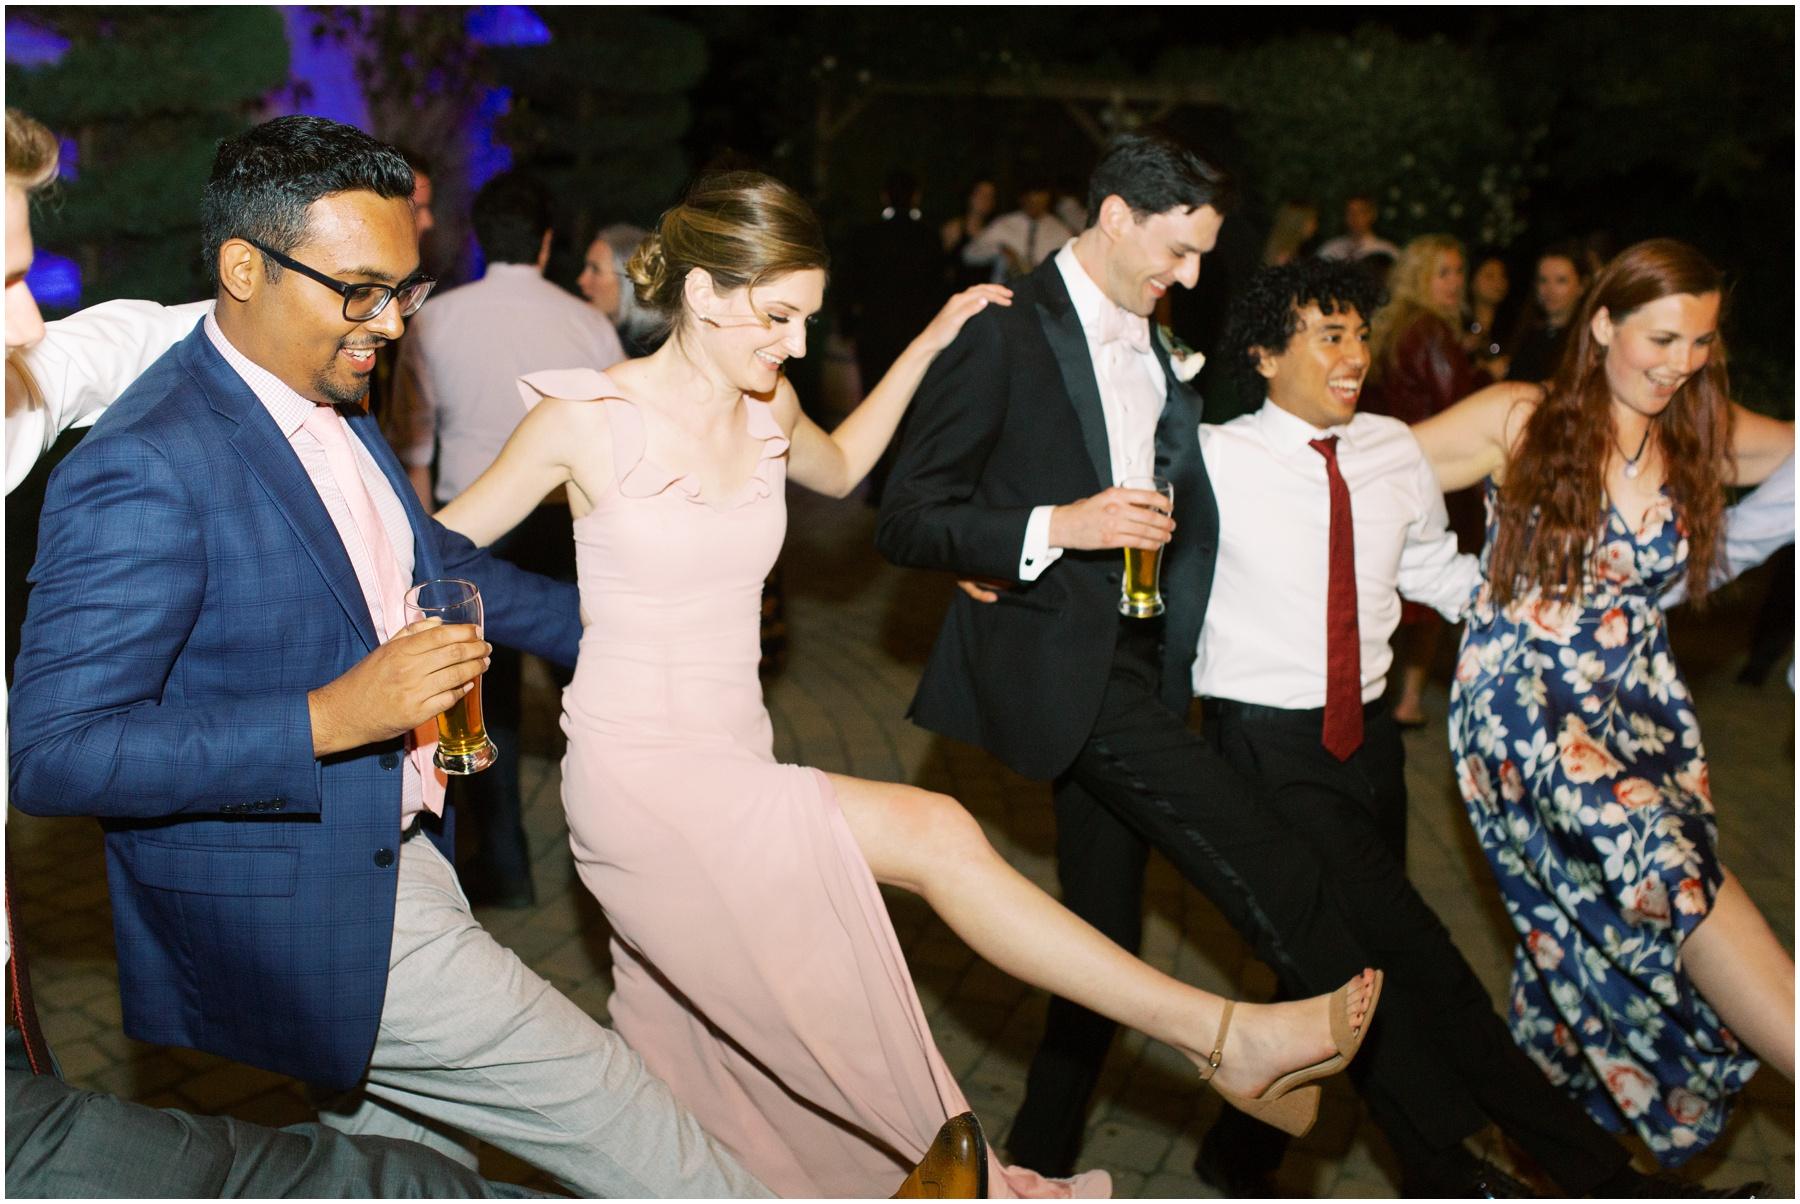 Scribner-bend-vineyards-wedding-sacramento-california-Kristine-Herman-Photography-216.jpg